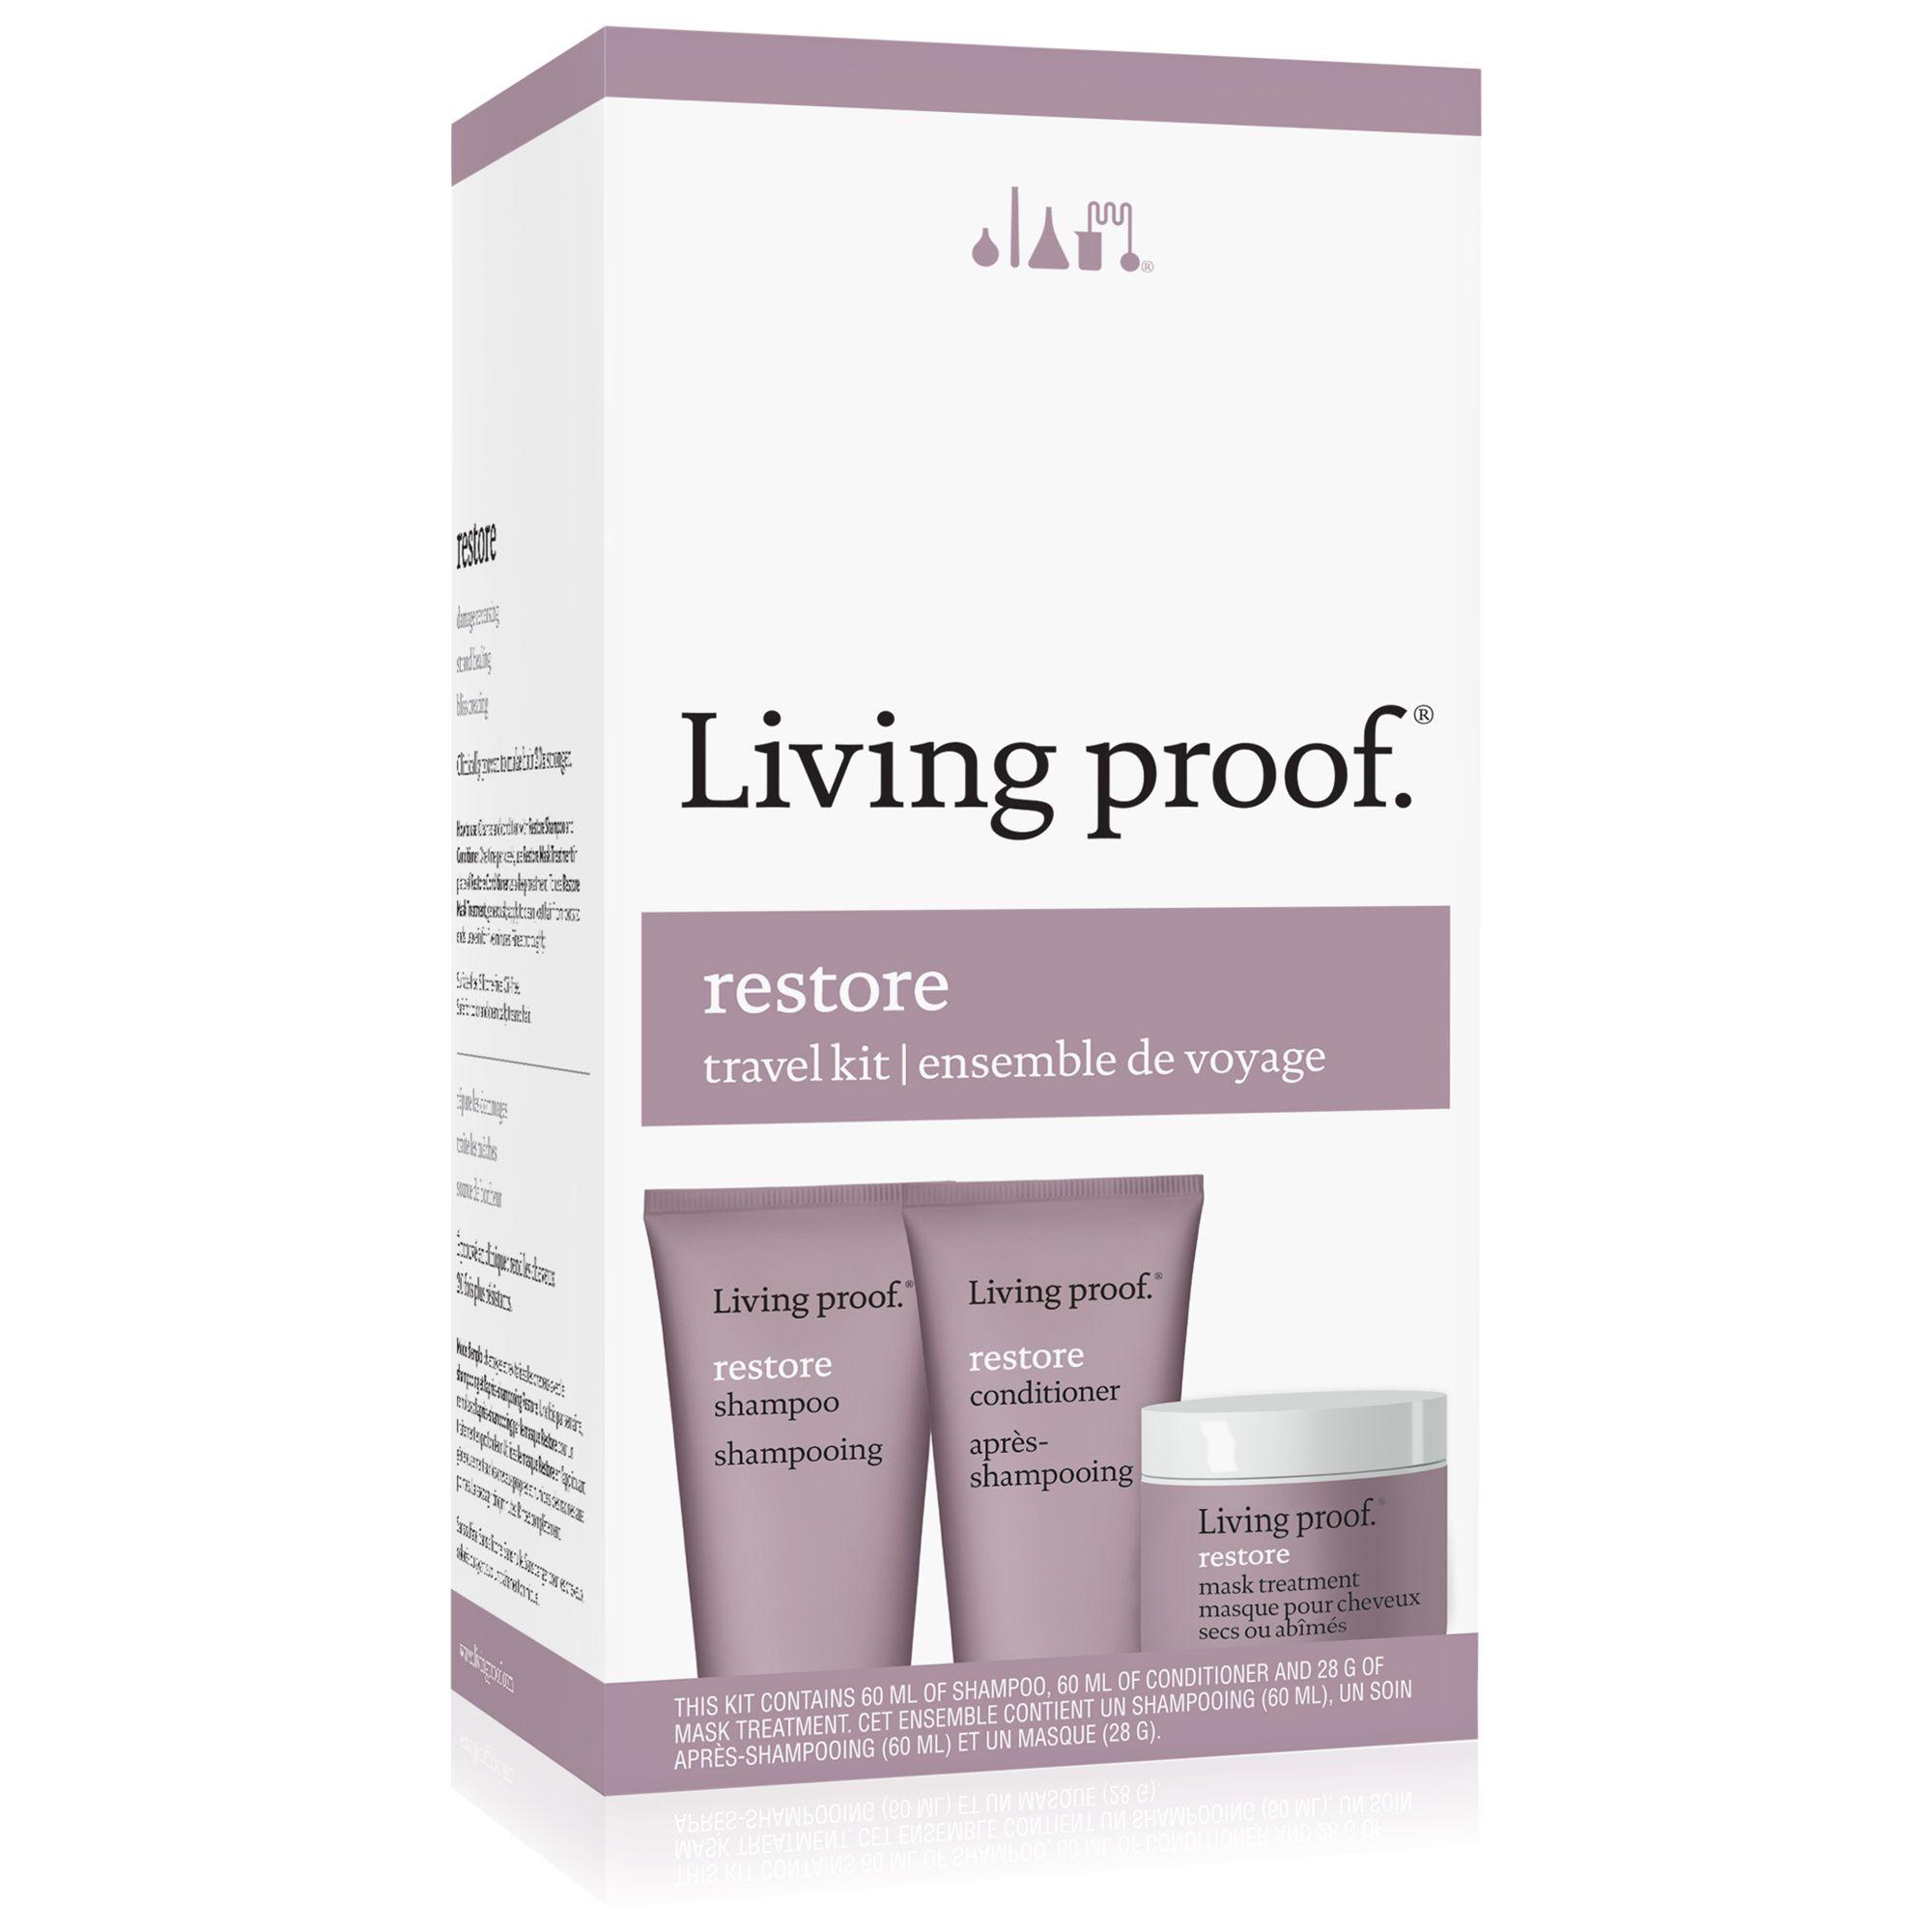 Living Proof Living Proof Restore Travel Kit Haircare Gift Set